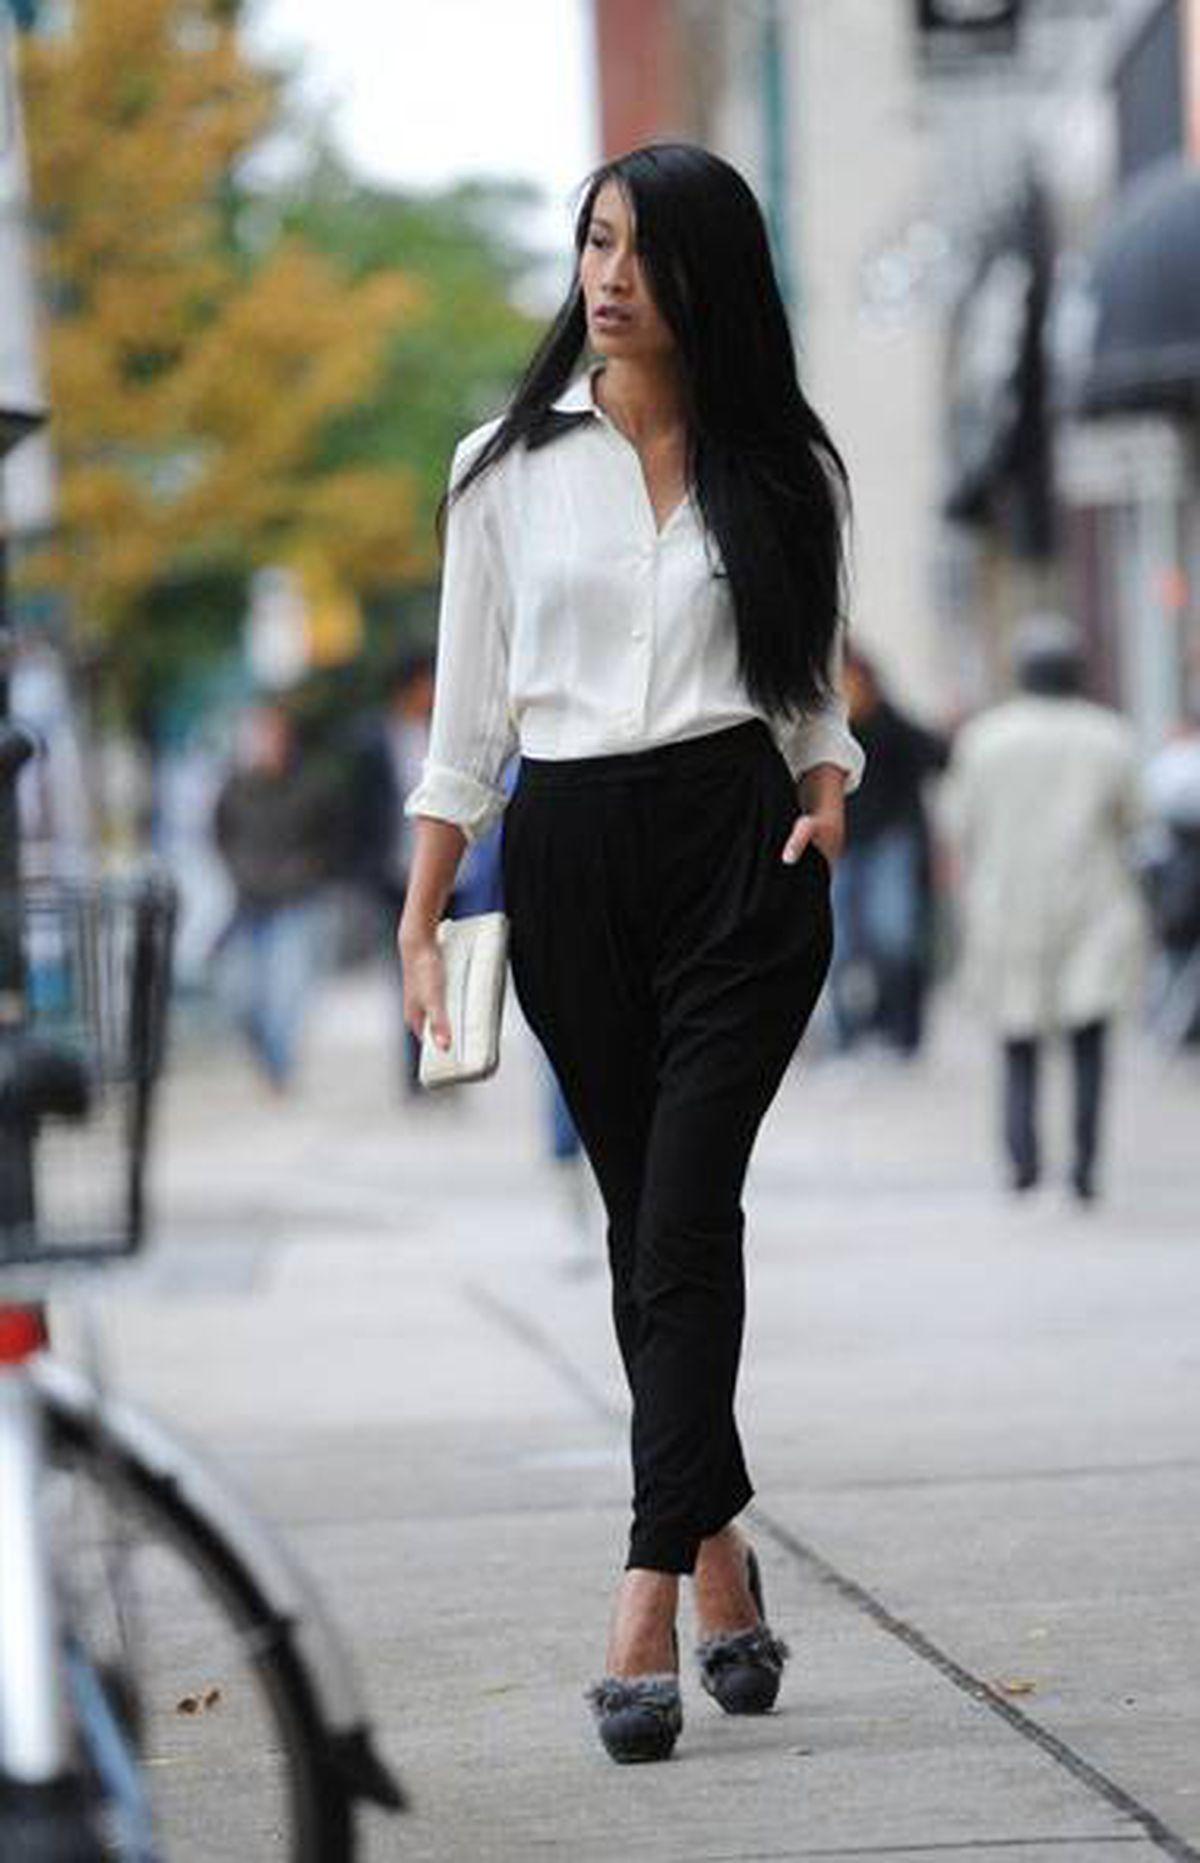 Chloe blouse, $595, Lida Baday pants, $425 at Holt Renfrew (www.holtrenfrew.com). Nina Ricci pumps, $995 at the Room (www.hbc.com).